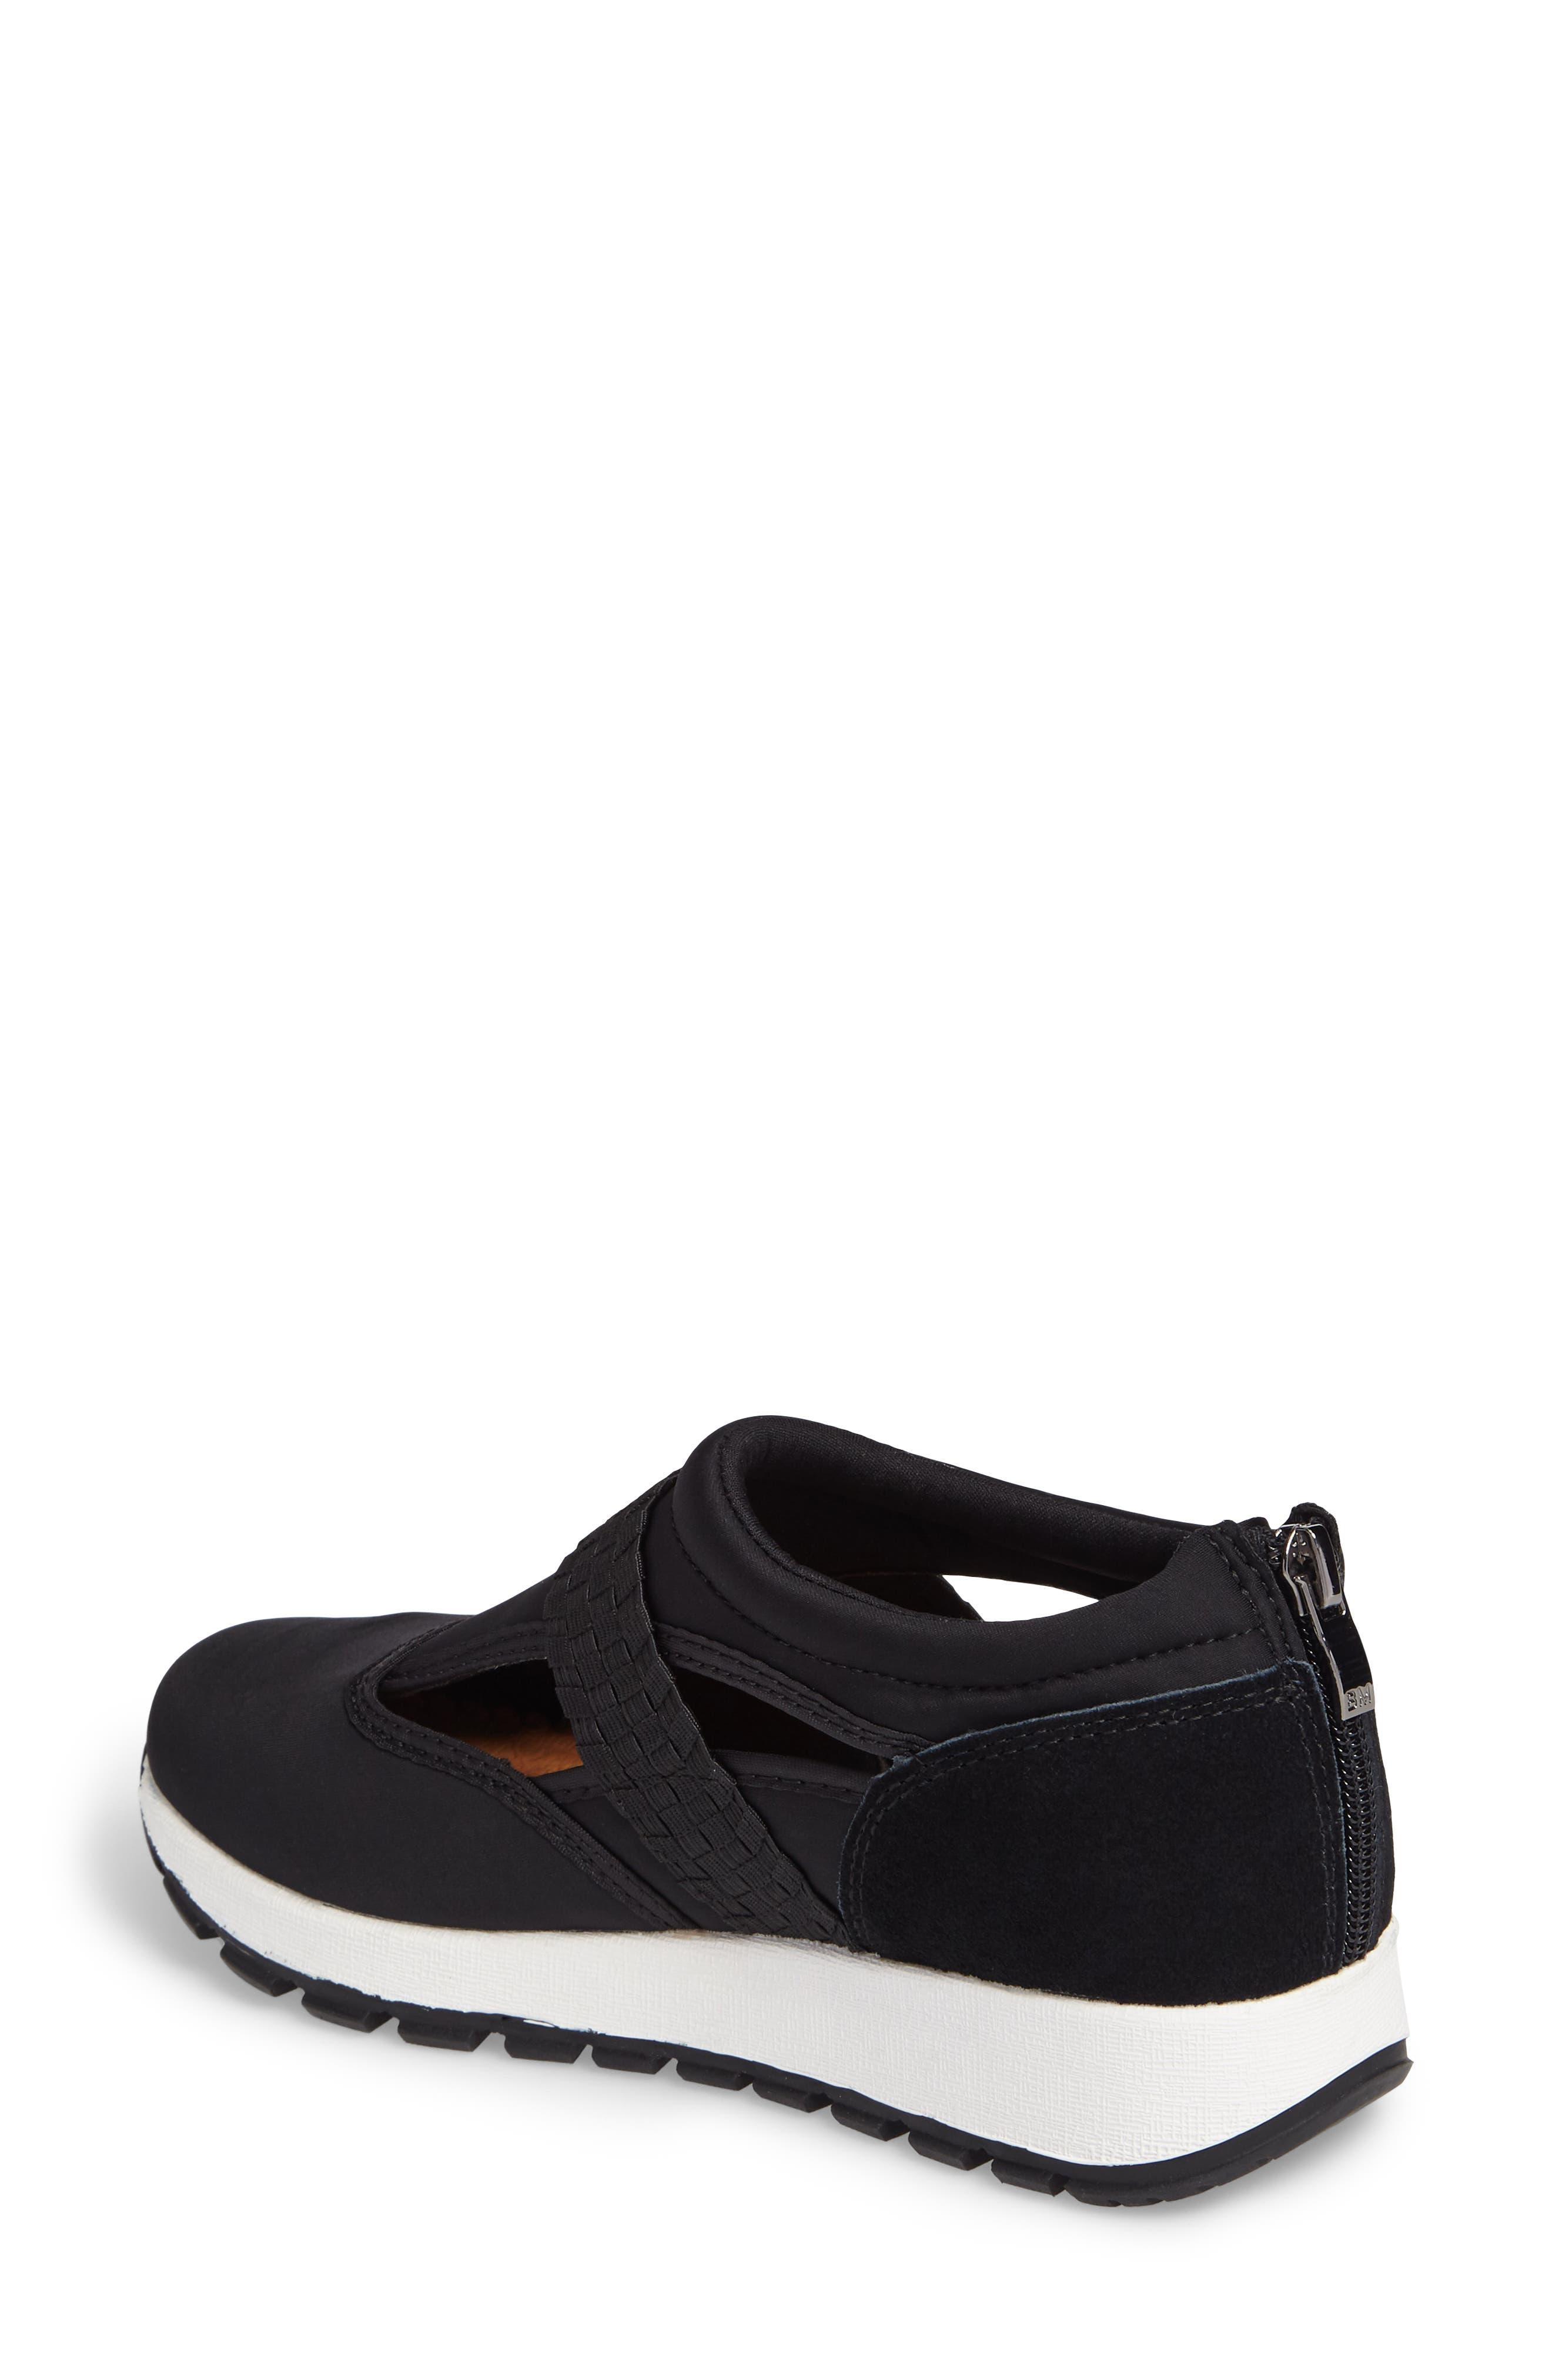 Bernie Mev Janelle Sneaker,                             Alternate thumbnail 2, color,                             BLACK FABRIC